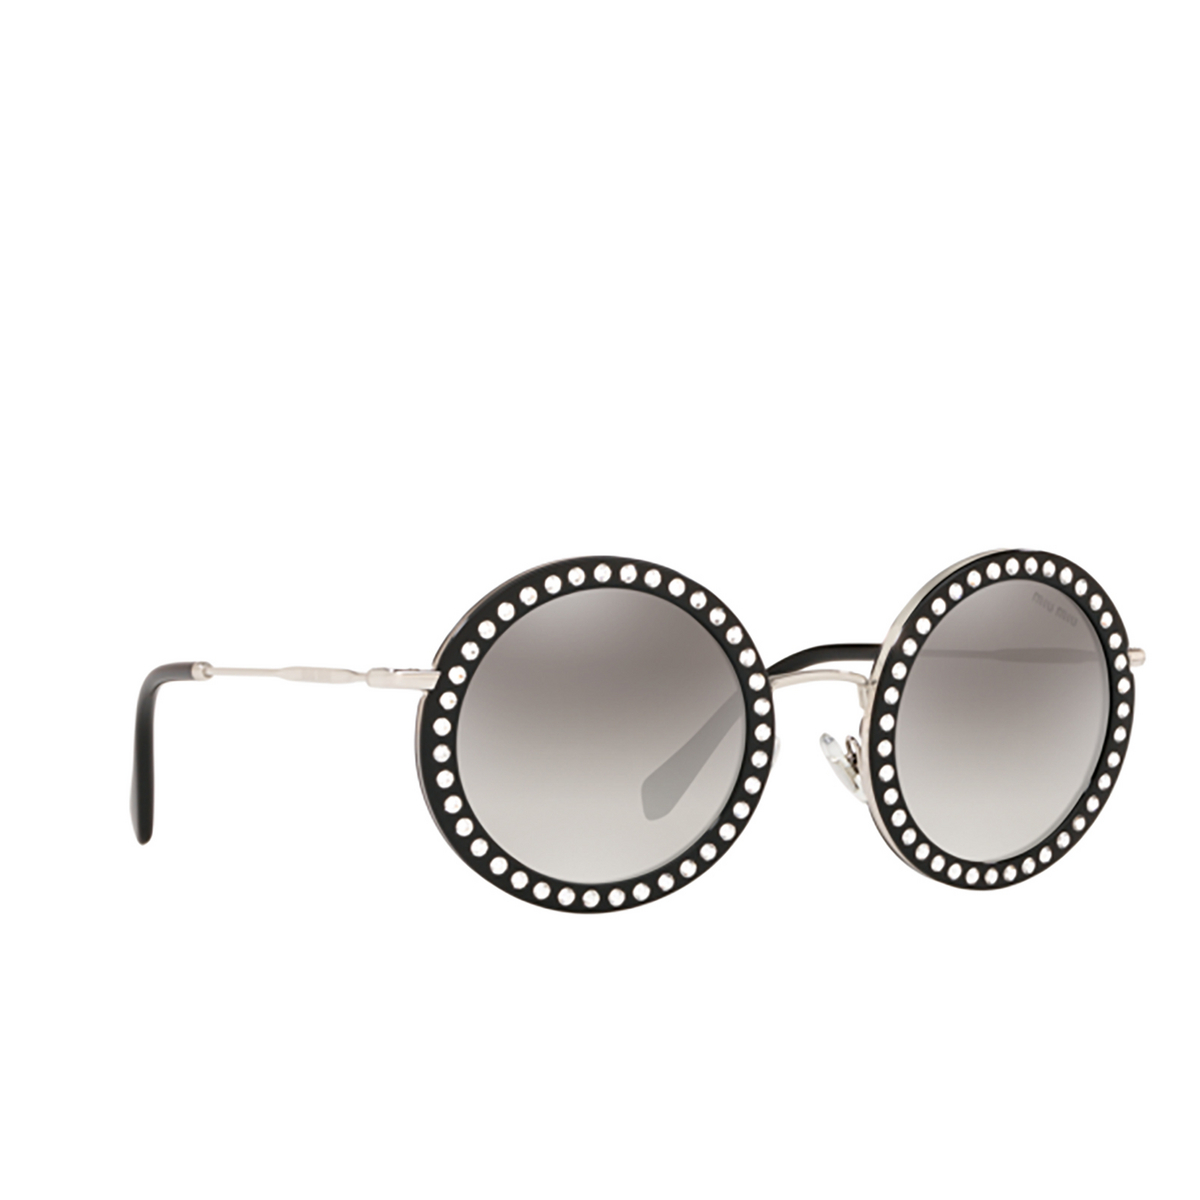 Miu Miu® Round Sunglasses: MU 59US color Black 1525O0.